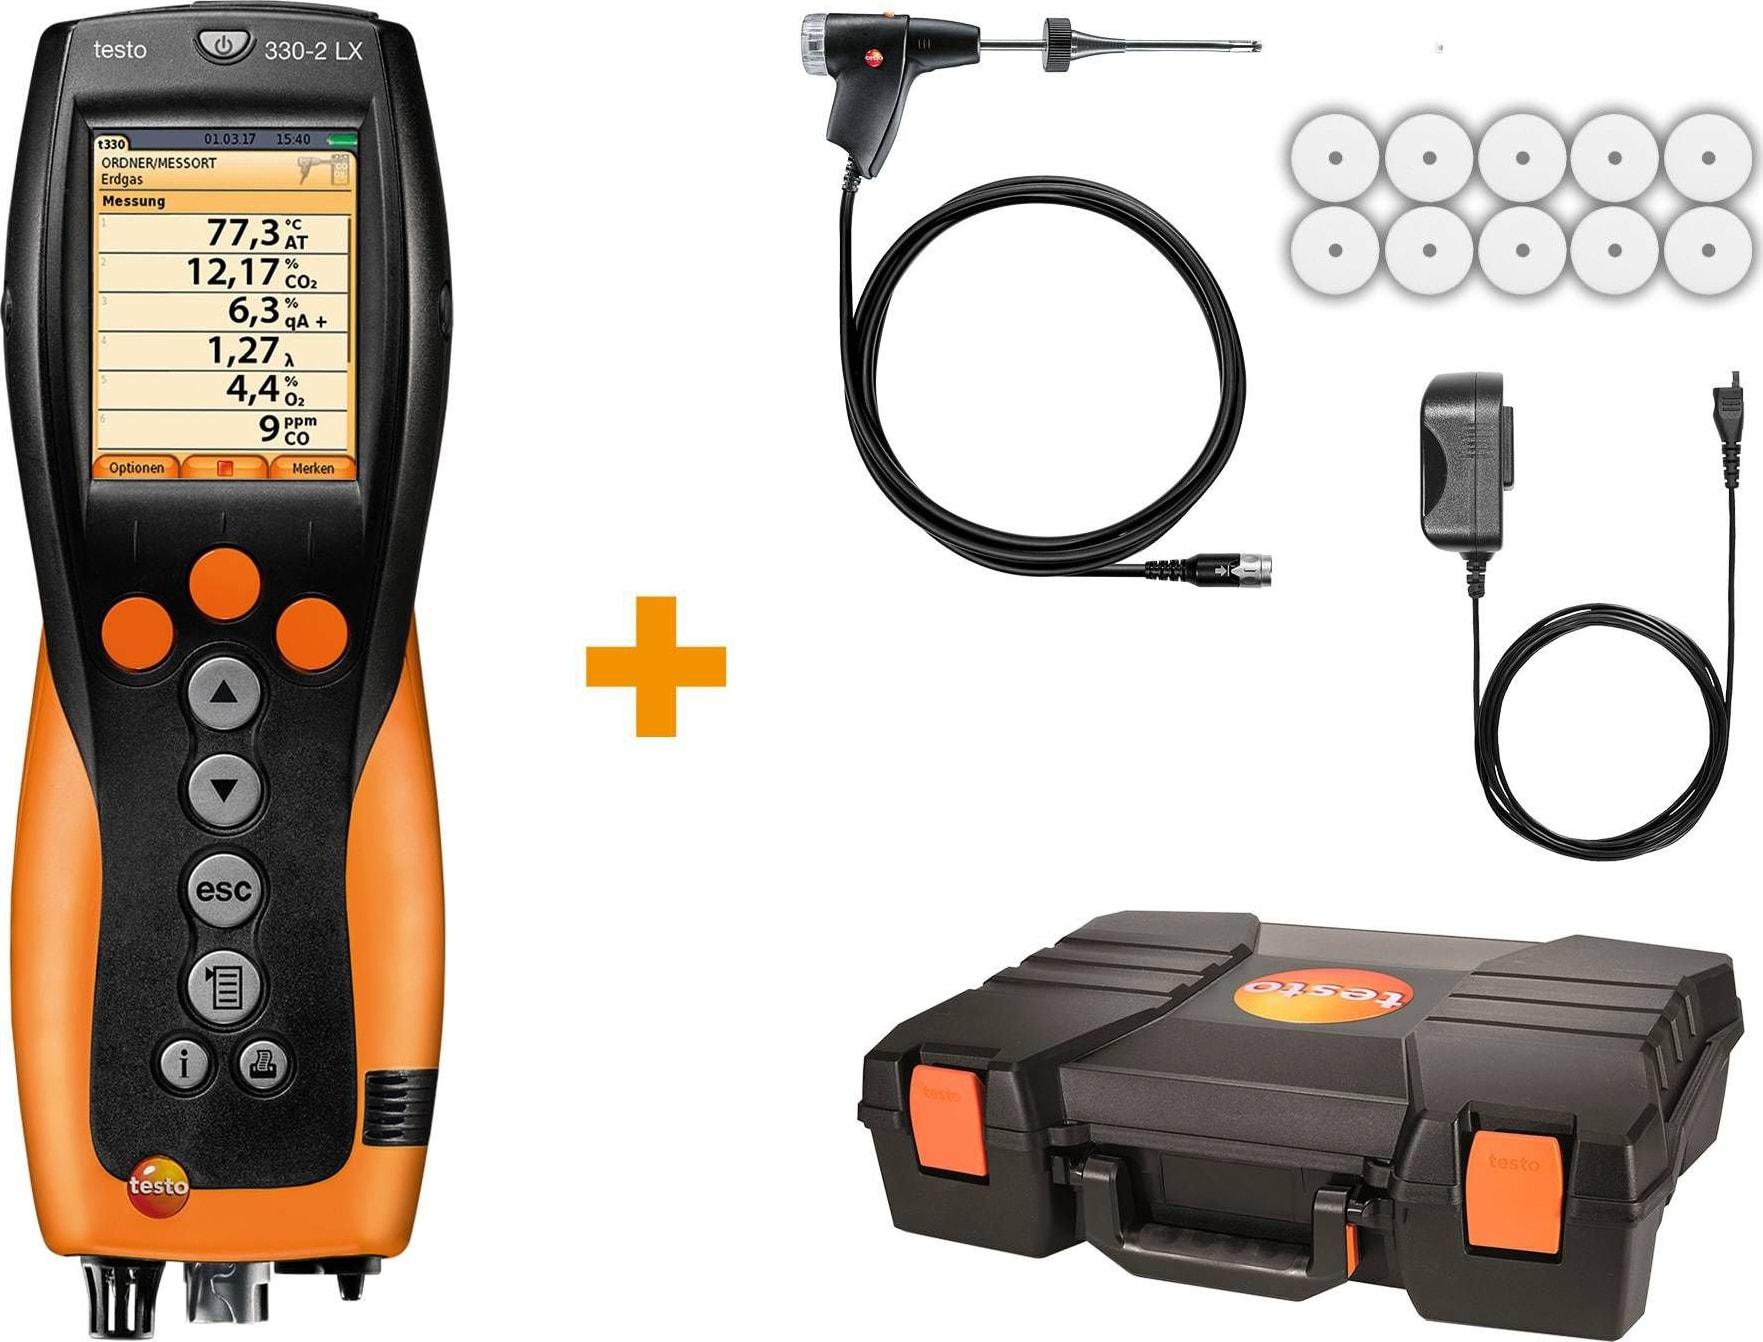 Testo 330-2 LX KIT 1 - Industrial Combustion Analyzer Kit